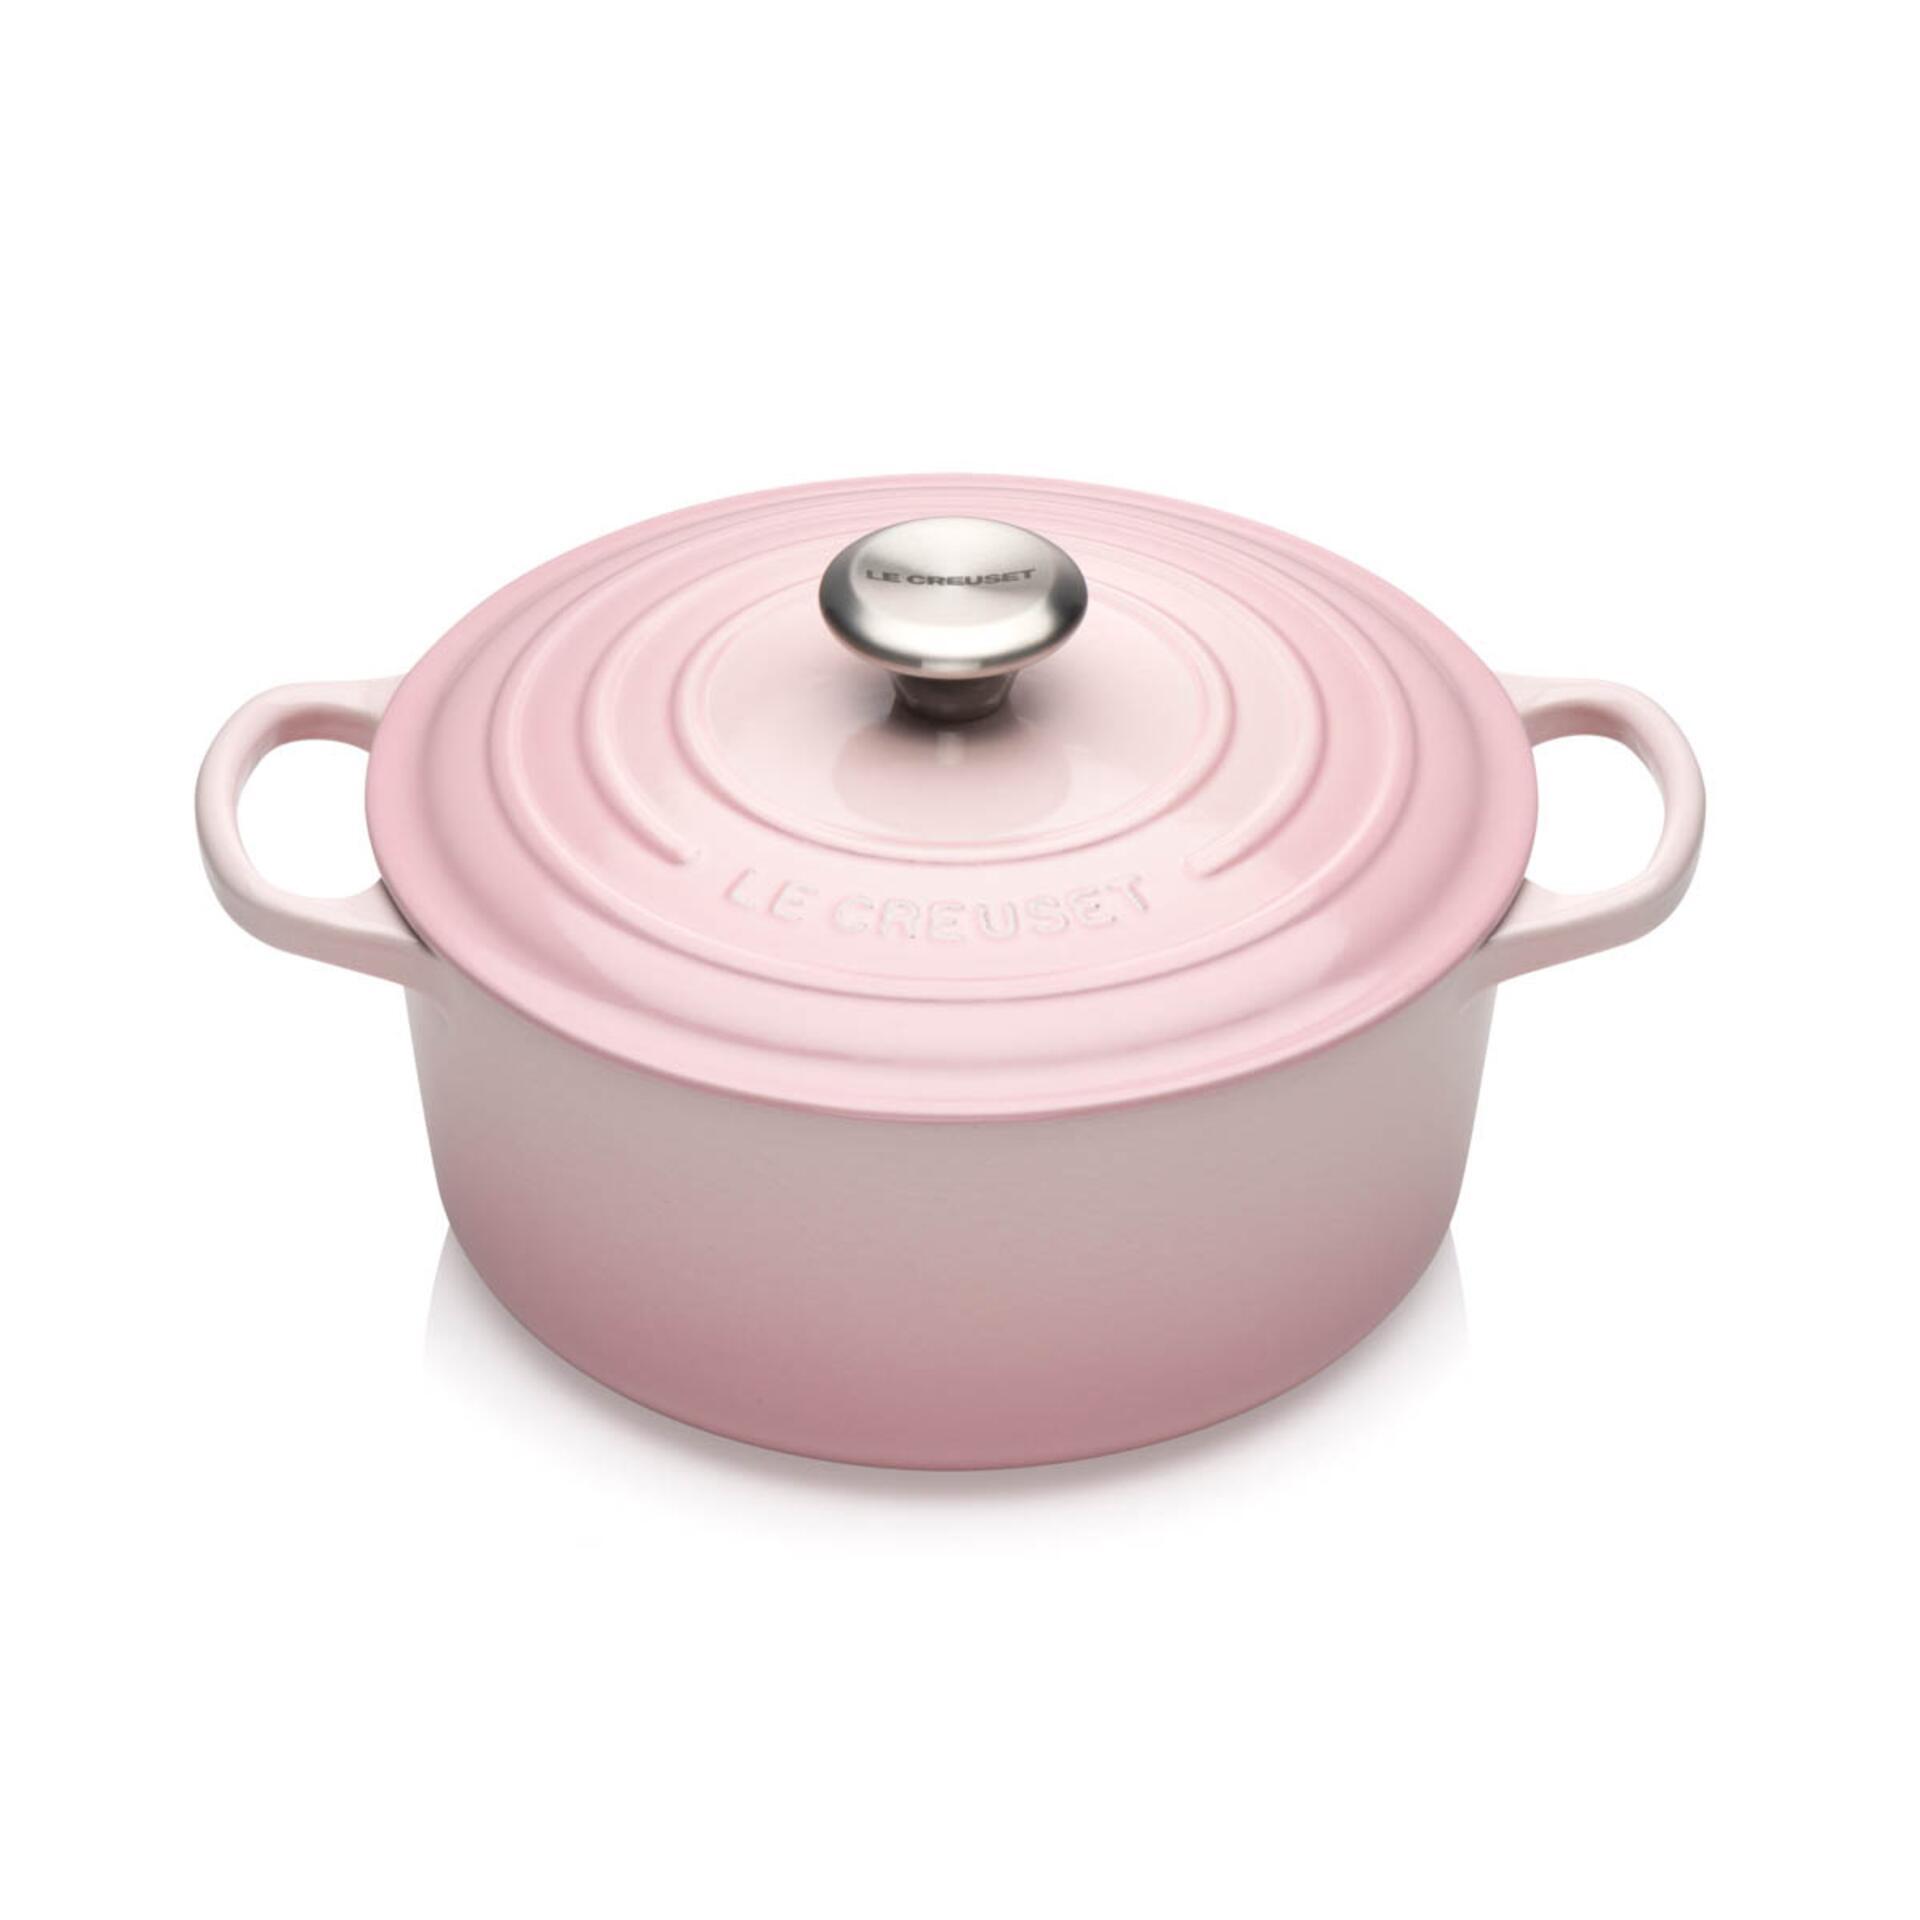 Le Creuset Bräter Signature 24 cm Shell Pink